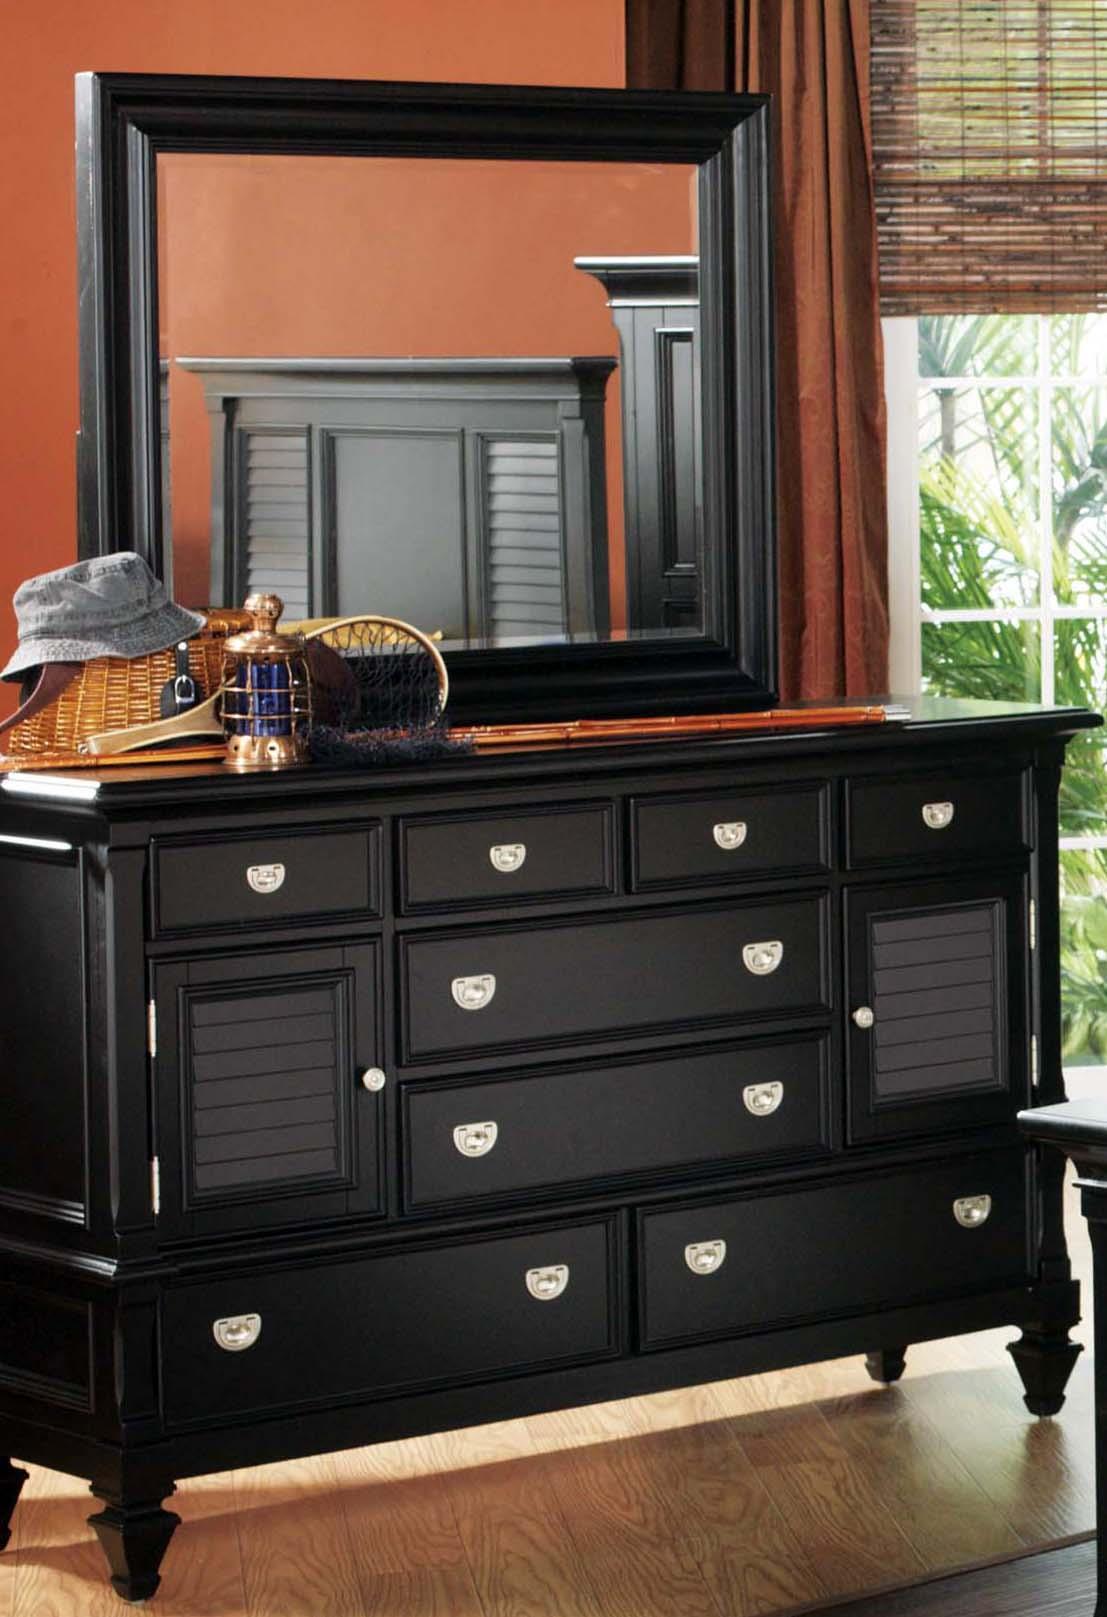 Holland House Black Dresser/Mirror - Item Number: P24987